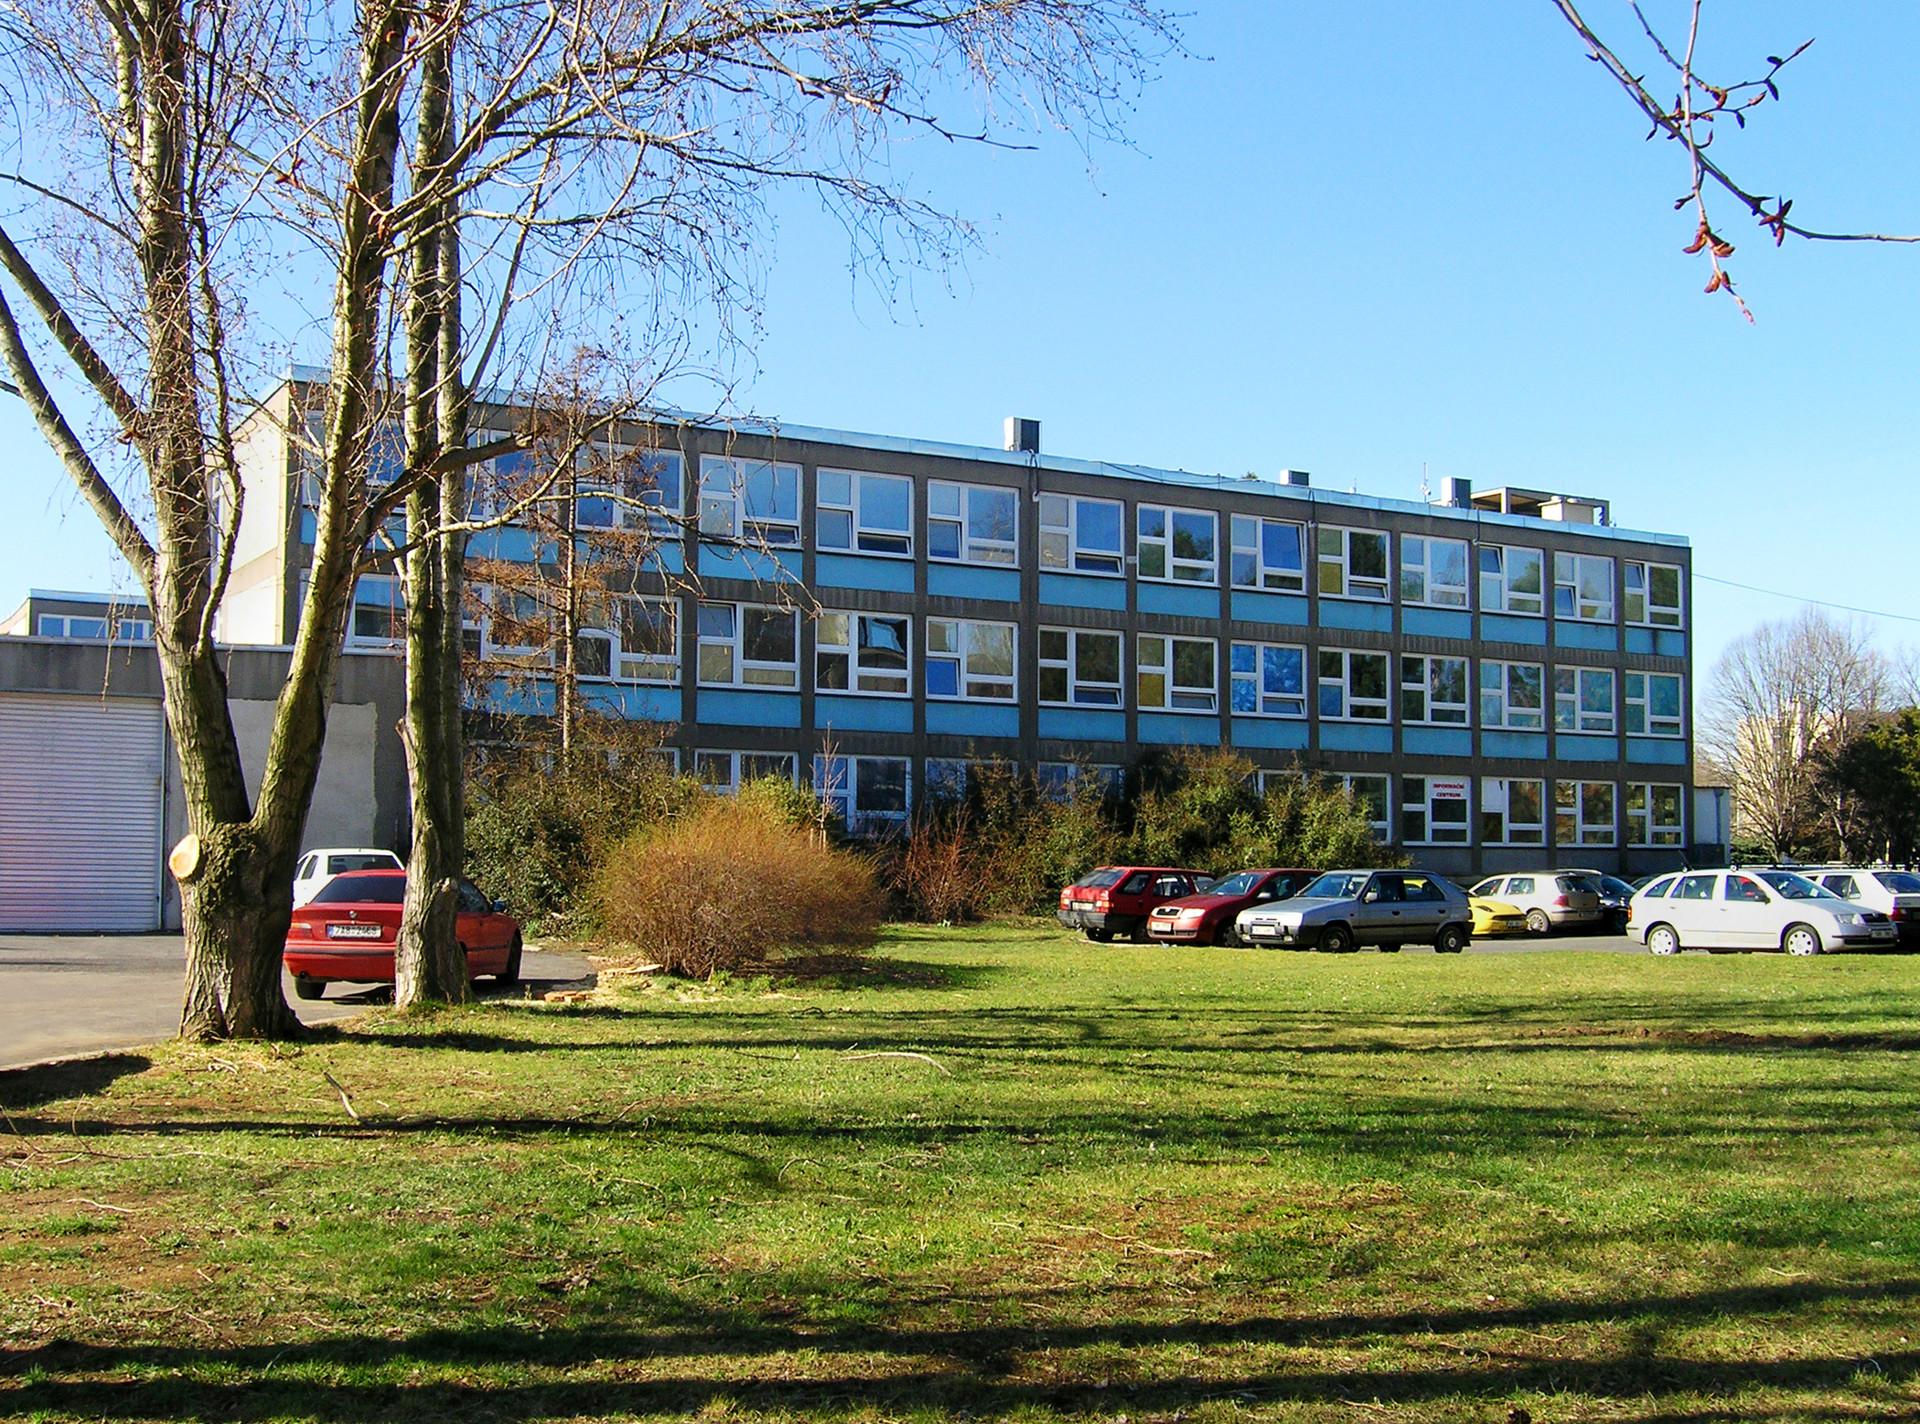 Esperienza alla Czech University of Life Sciences di Praga, Repubblica Ceca di Lucie